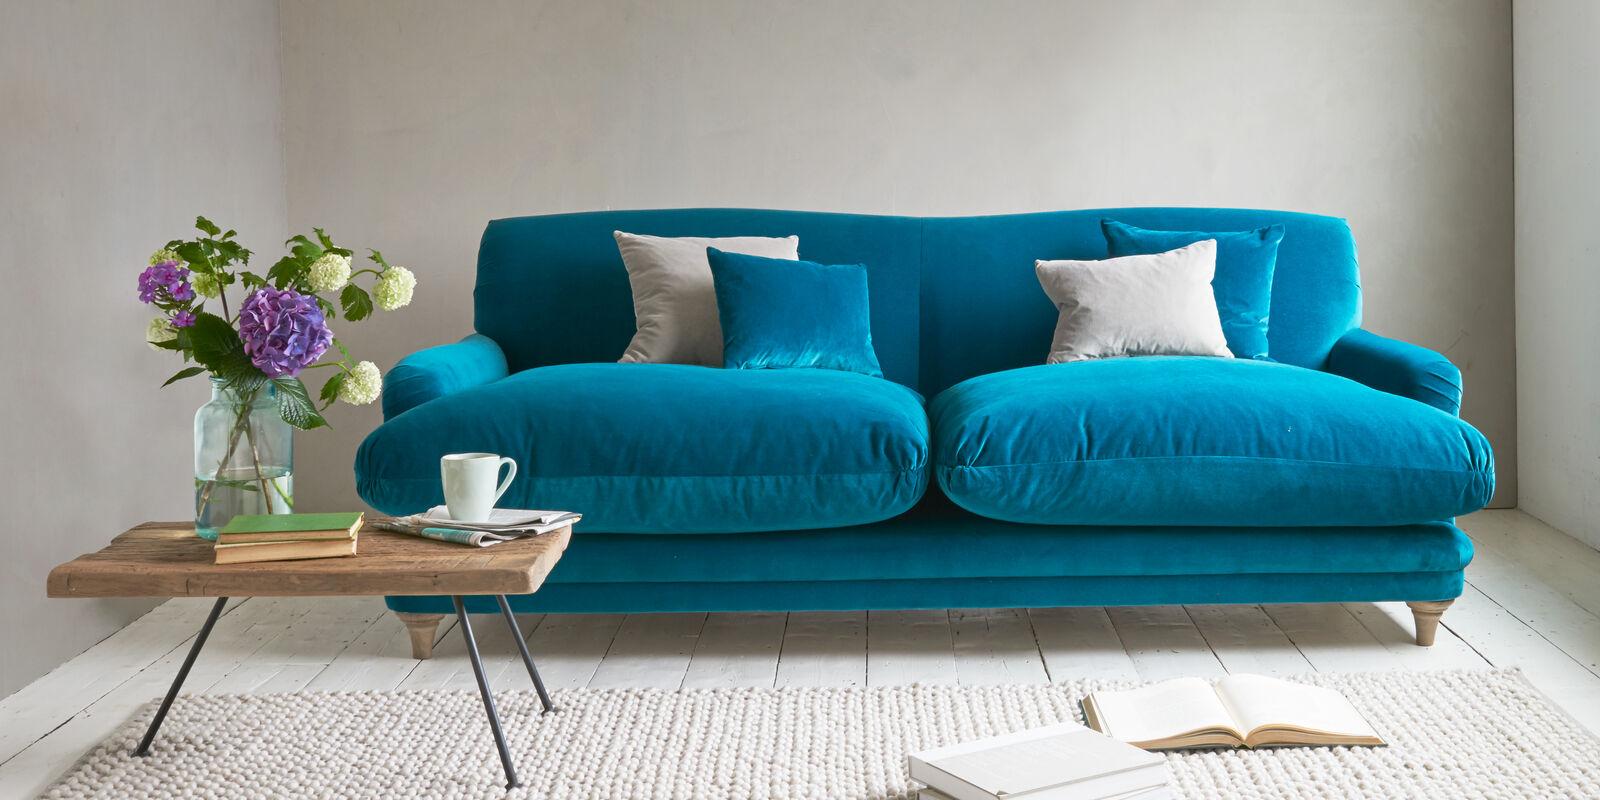 Pudding sofa in blue velvet fabric